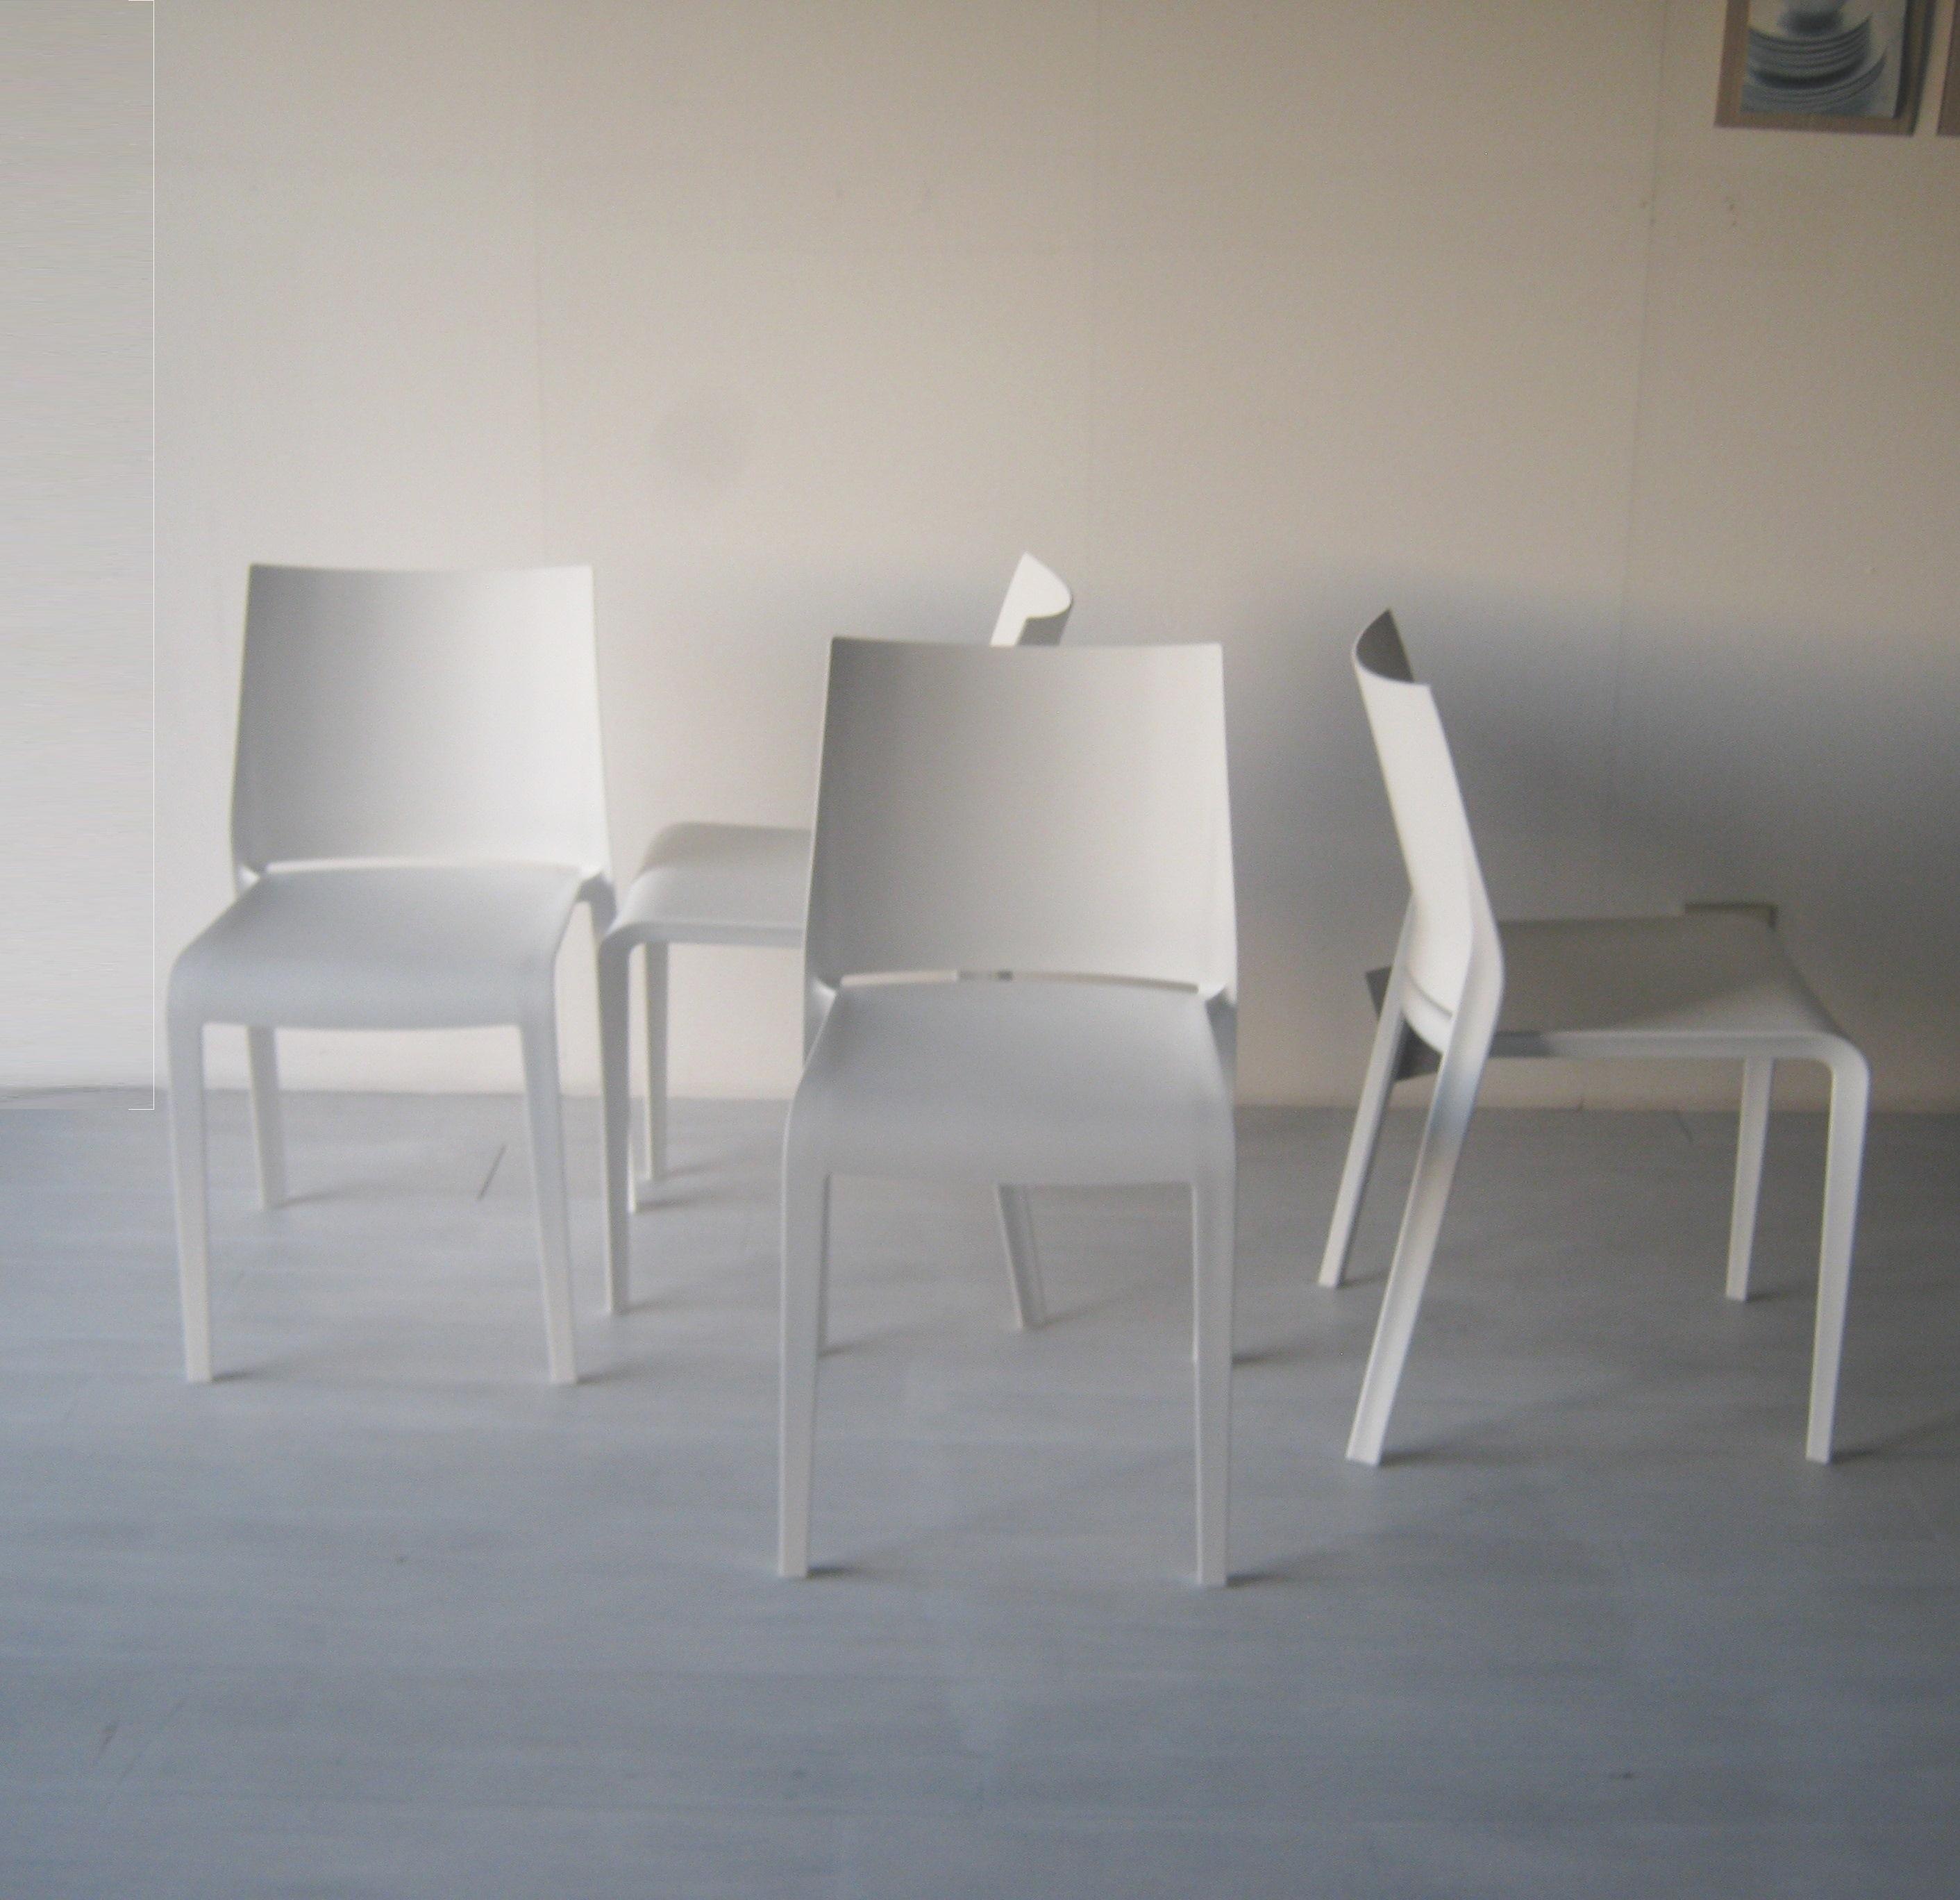 Sedia desalto set 4 sedie riga impilabili desalto outlet for Outlet sedie ufficio